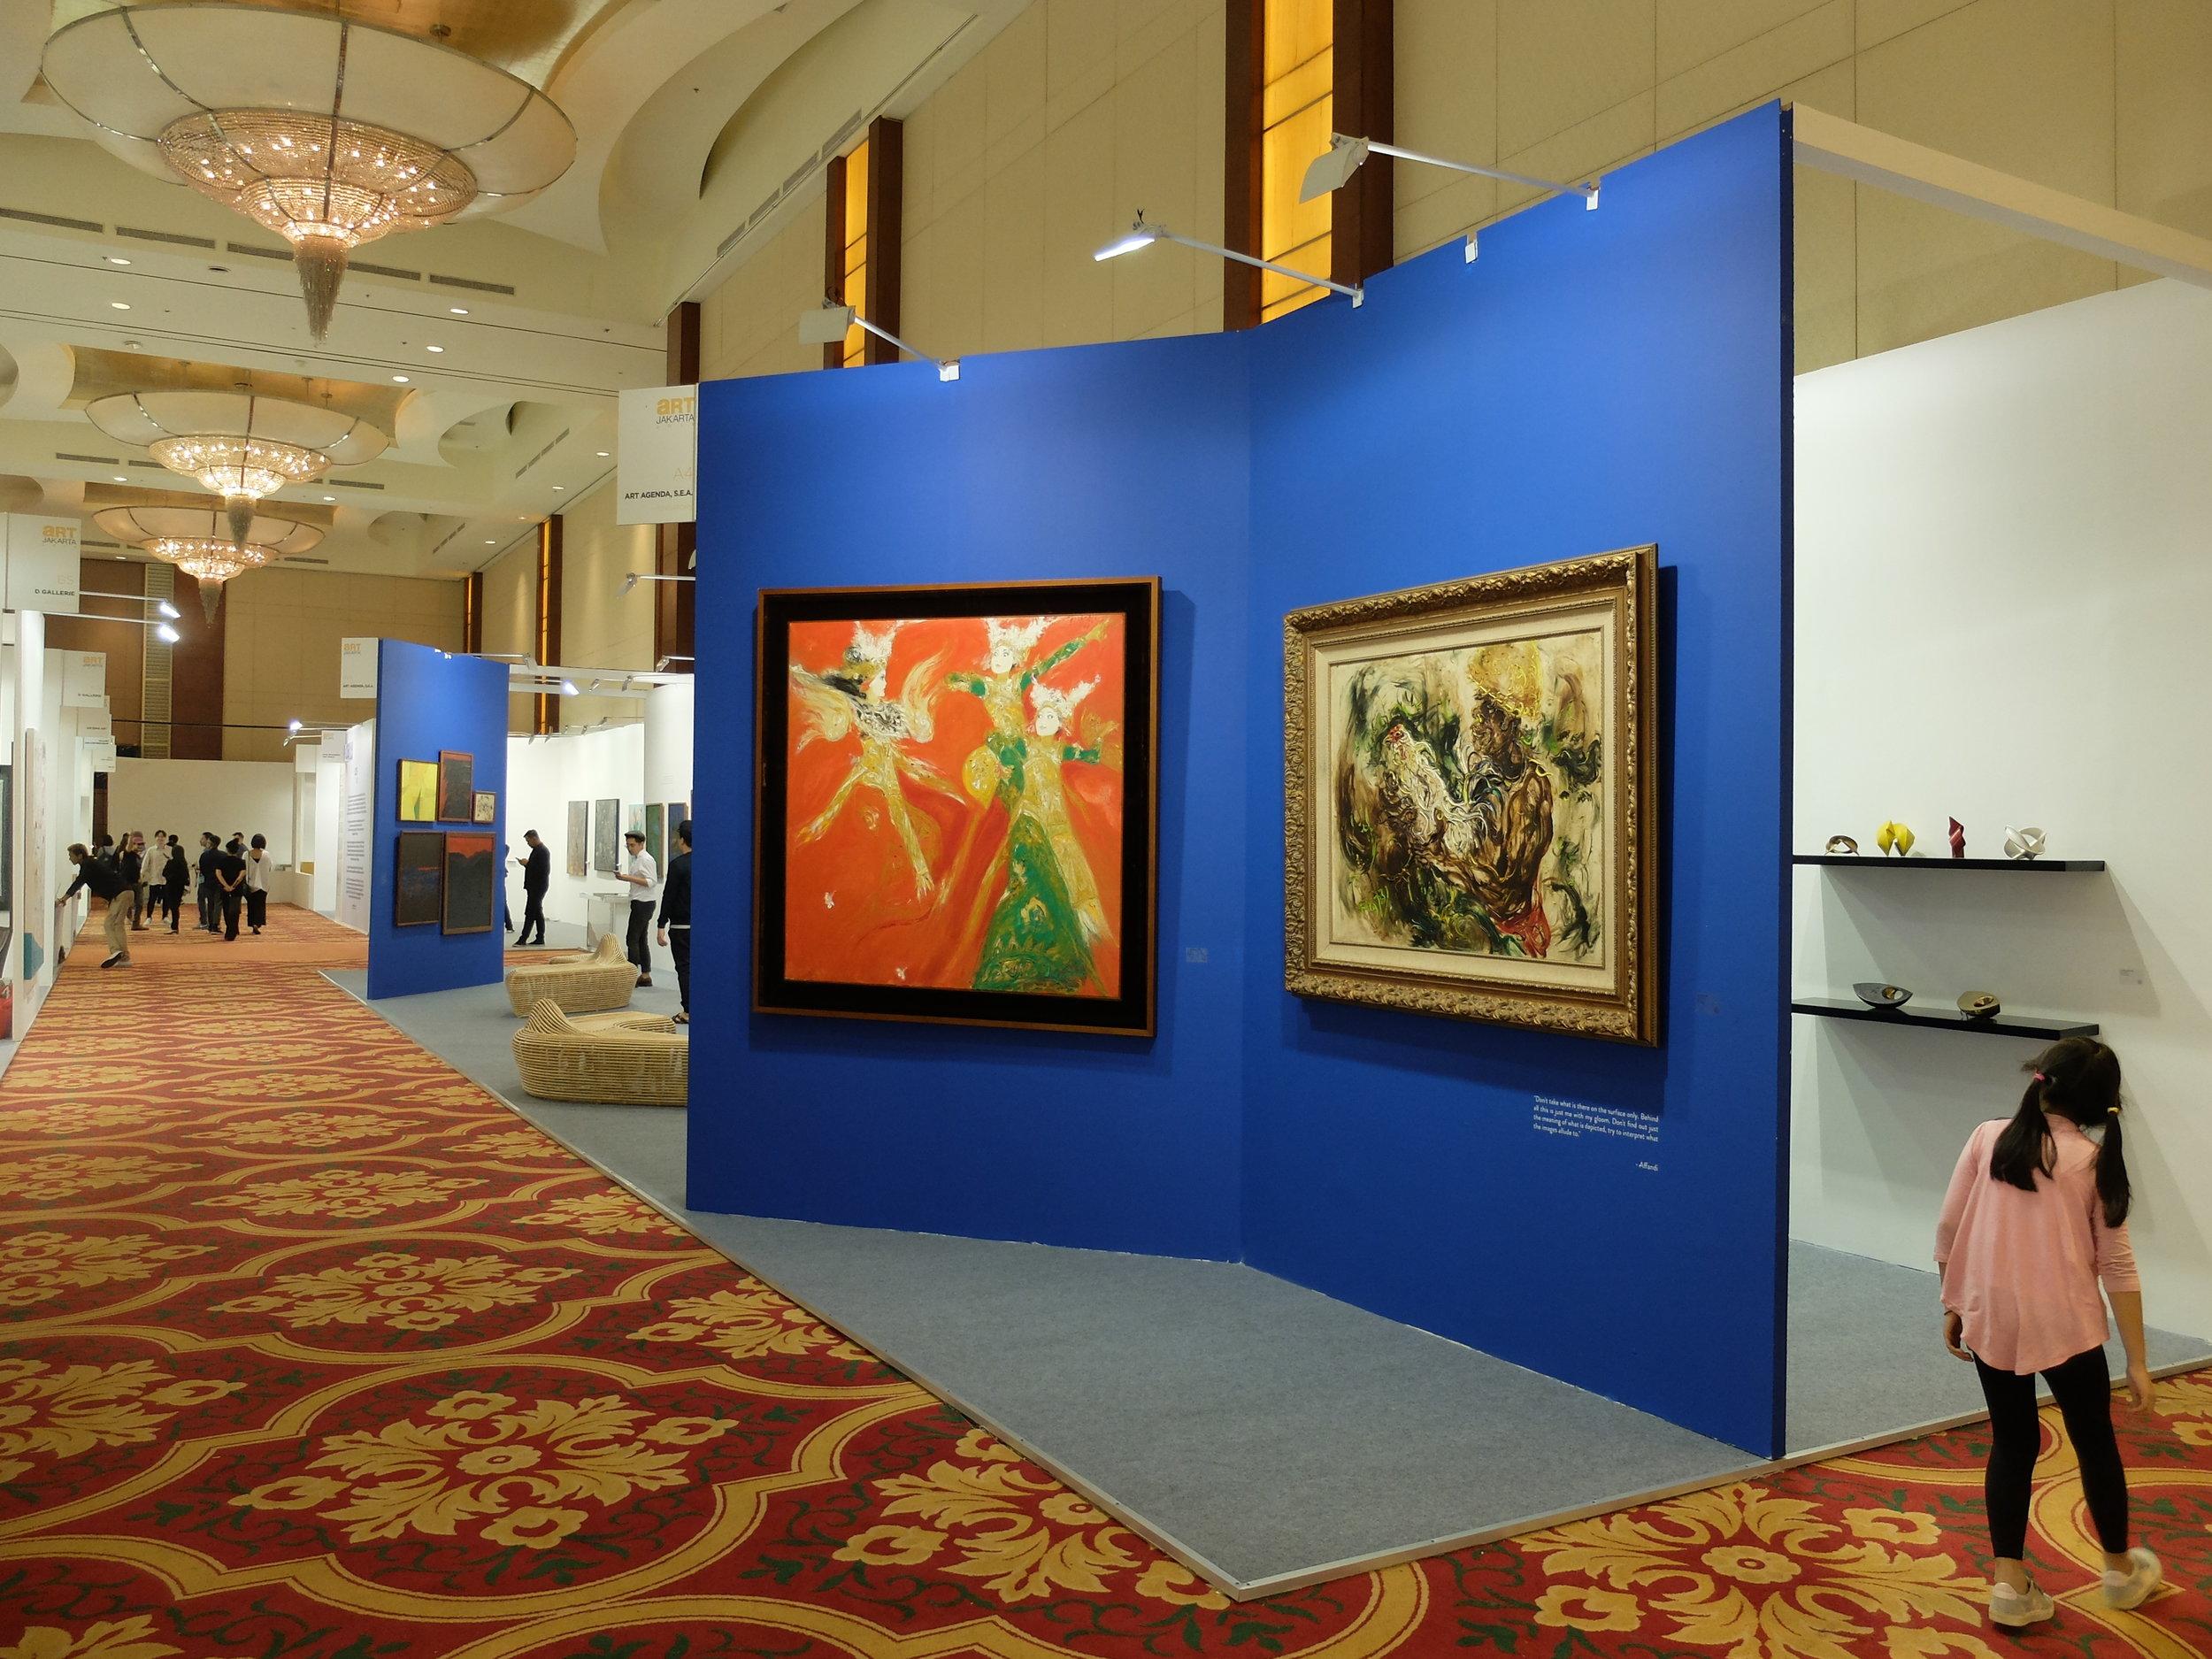 Art Agenda, S.E.A.'s booth at Art Jakarta 2018, featuring Srihadi Soedarsono and Affandi